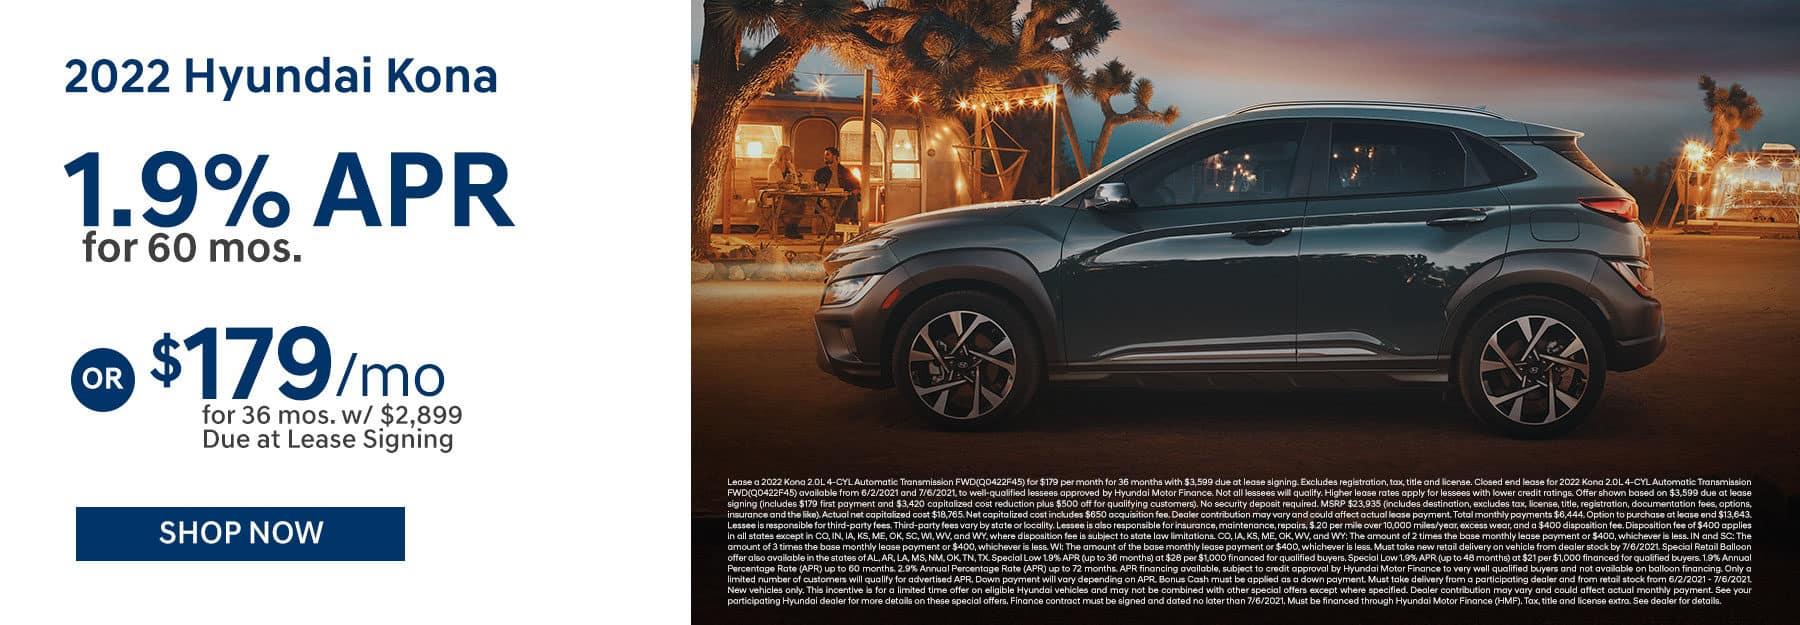 2022 Hyundai Kona June Offer in Greenville, TX